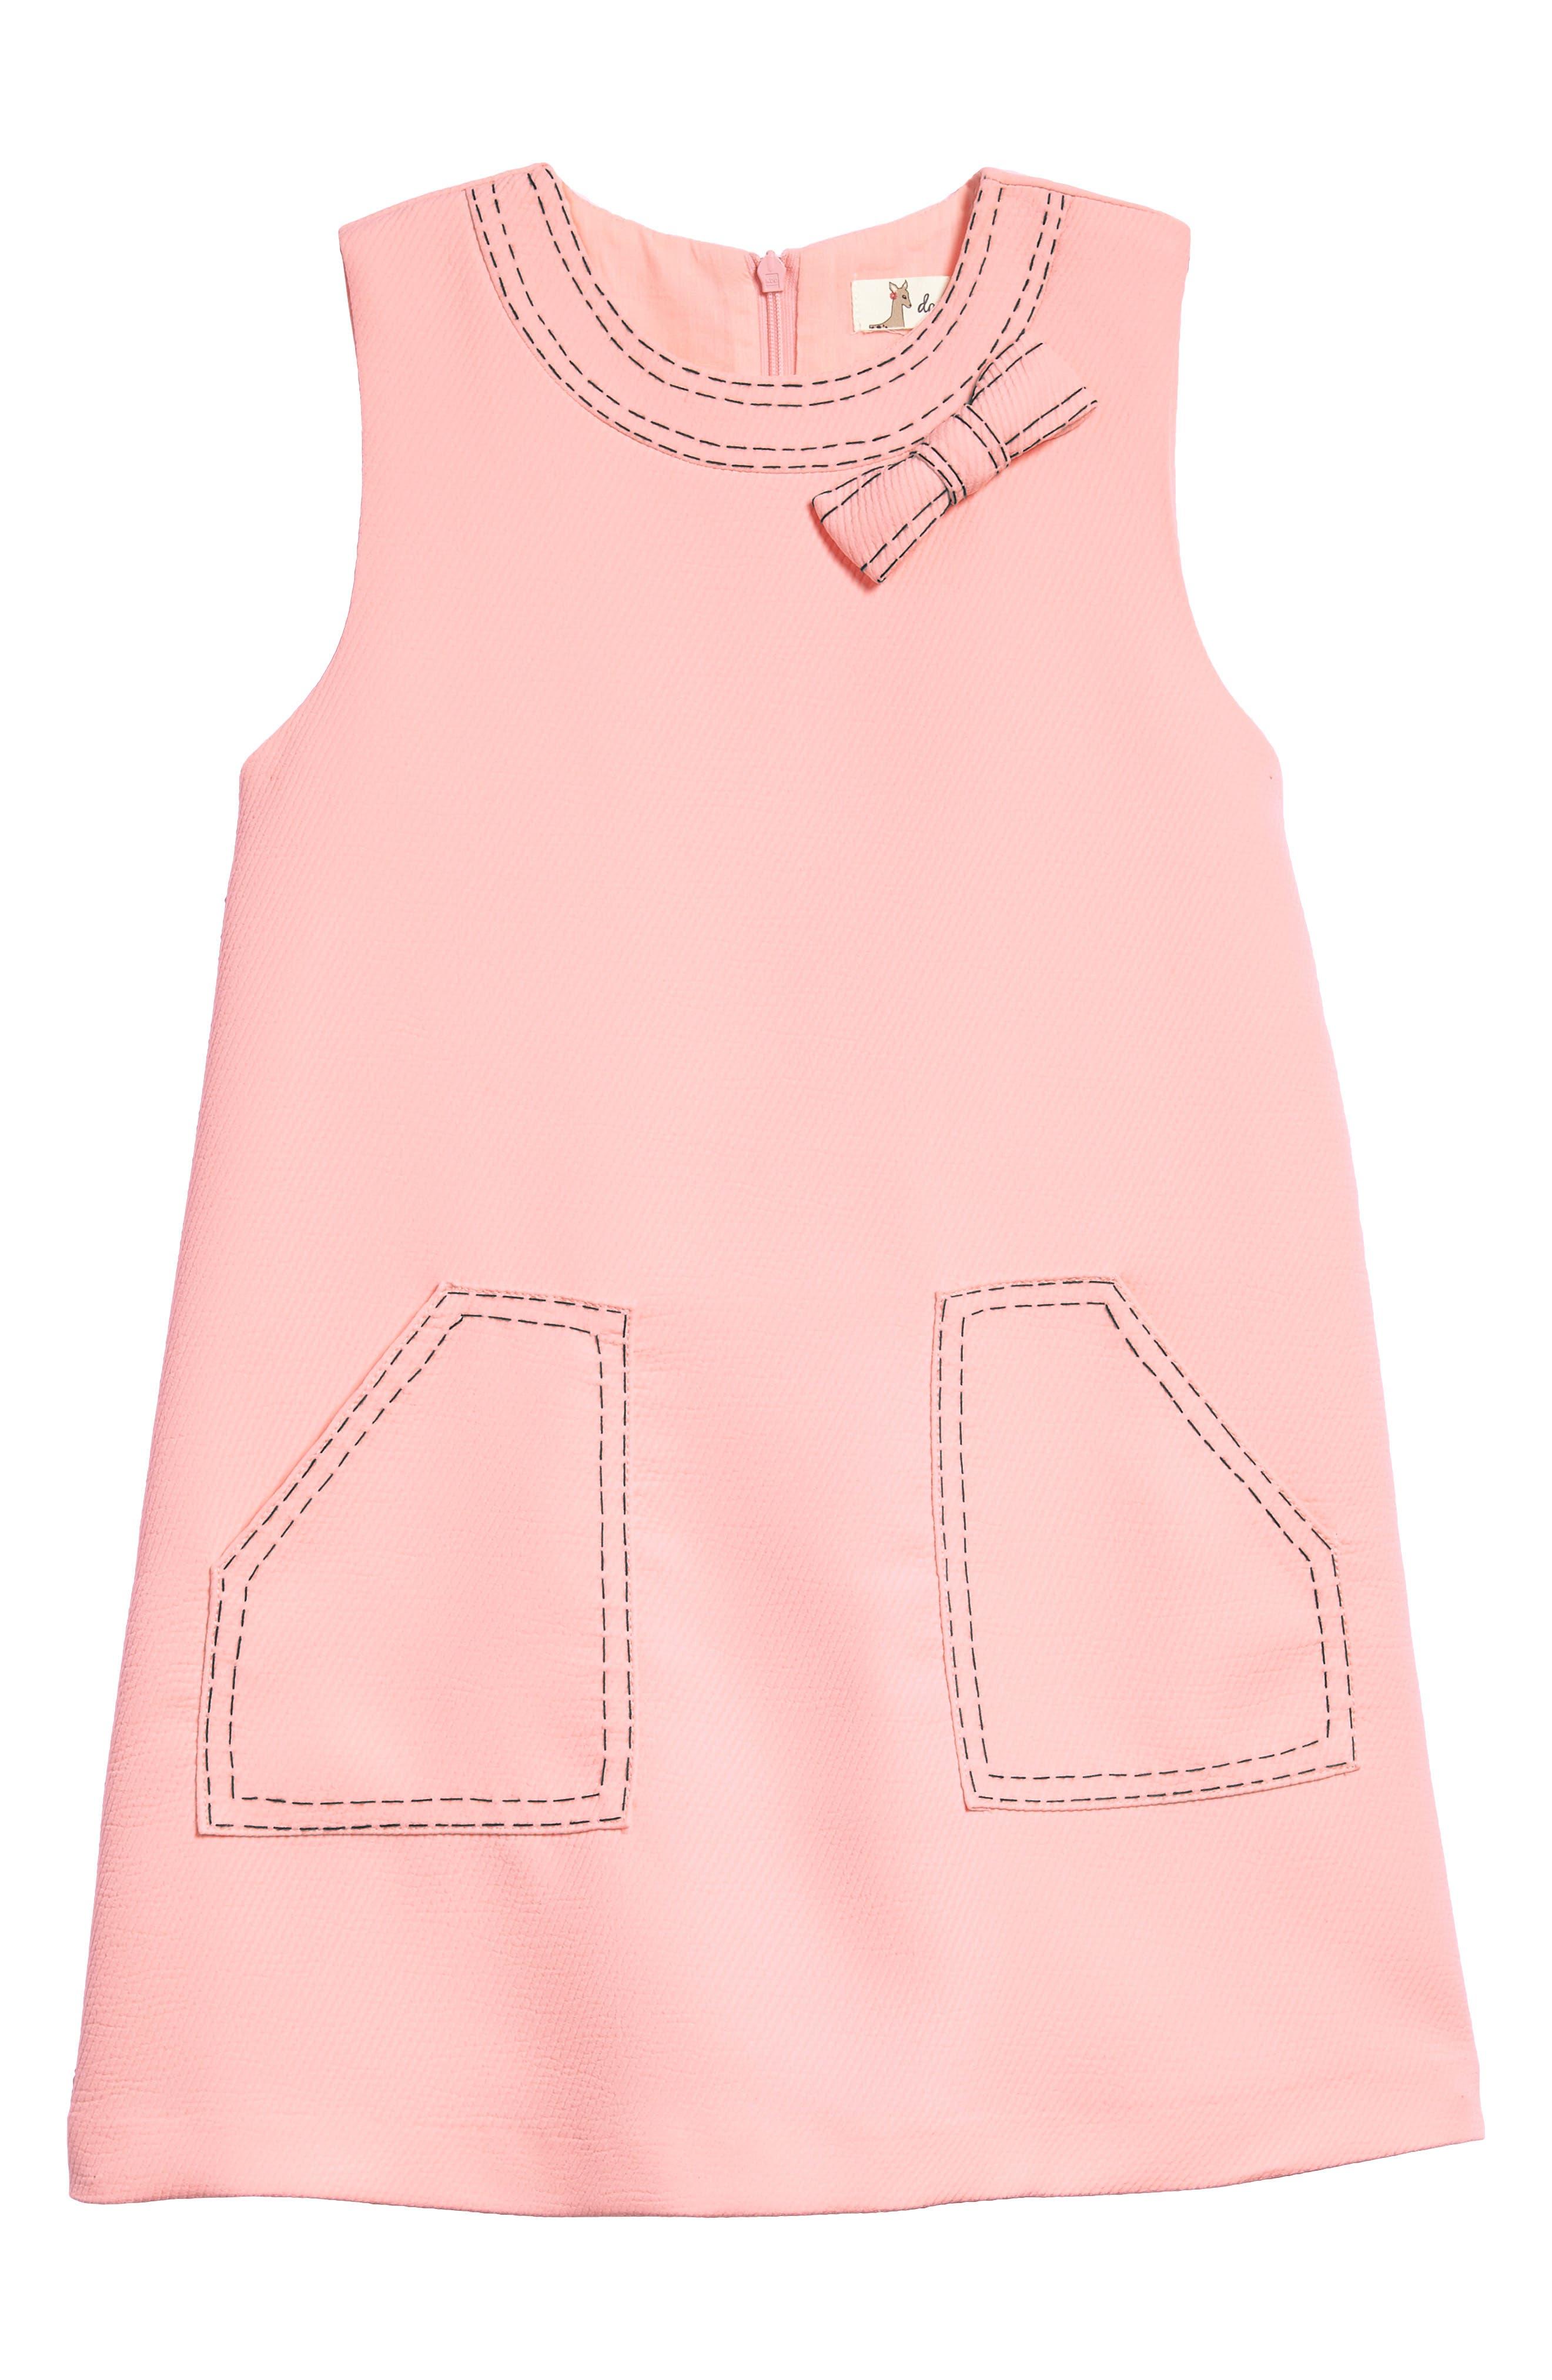 Mod Sleeveless Shift Dress,                             Main thumbnail 1, color,                             Pink